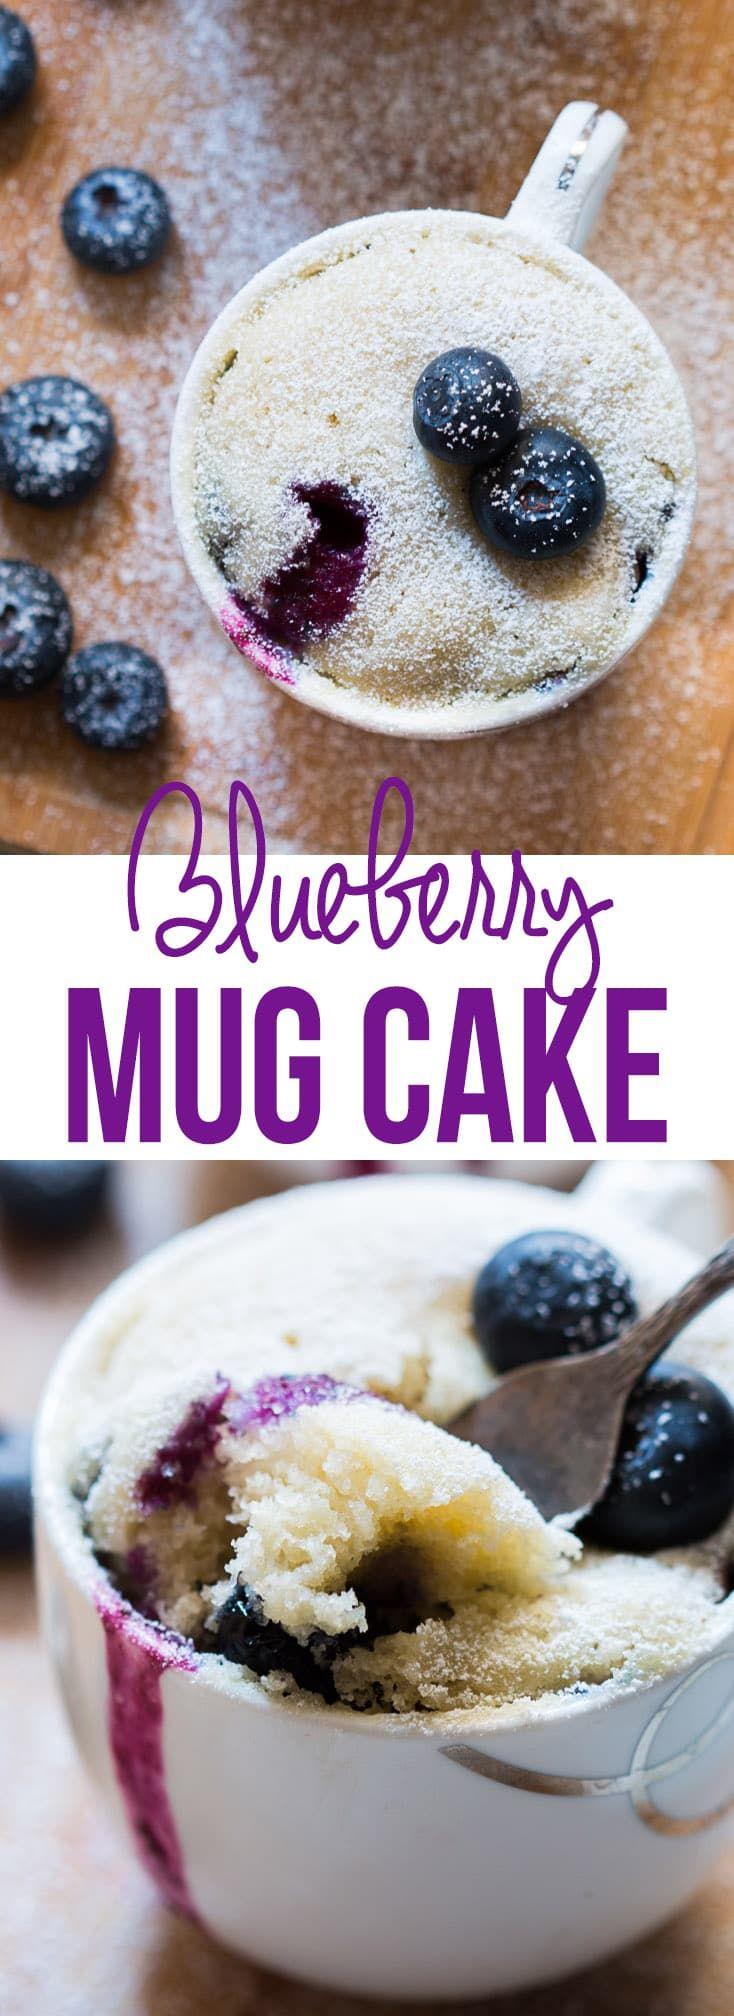 Eggless Blueberry Microwave Mug Cake | Recipe | Mug ...